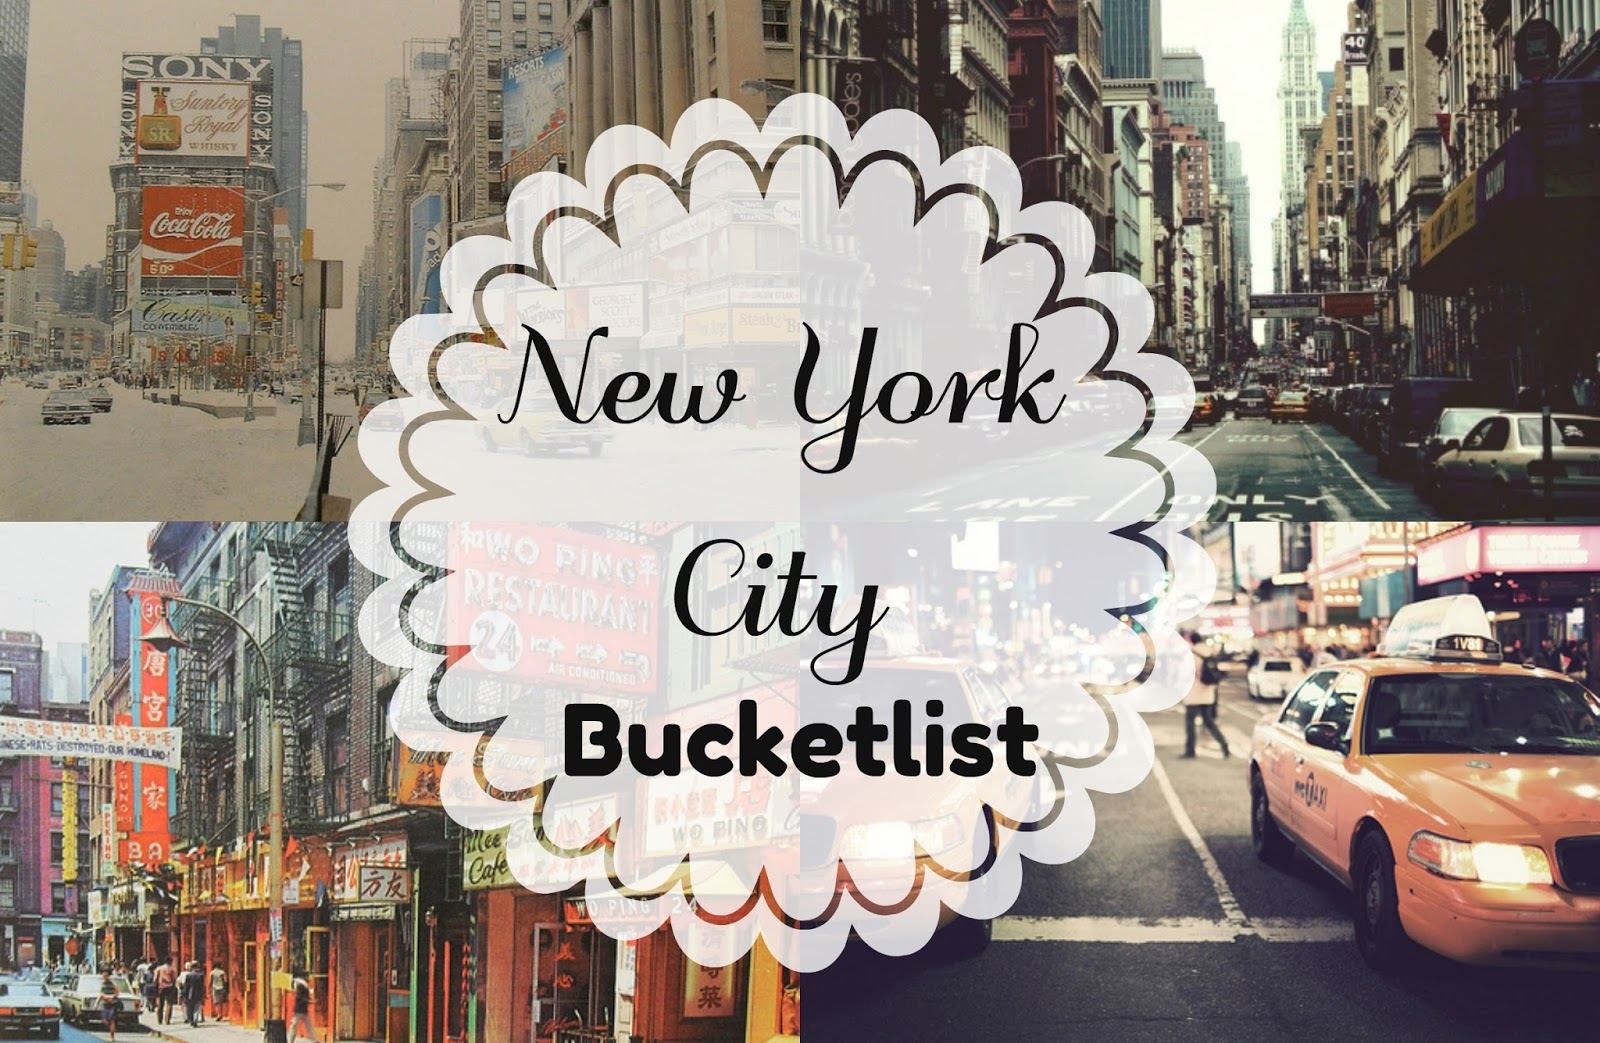 New York City Bucketlist